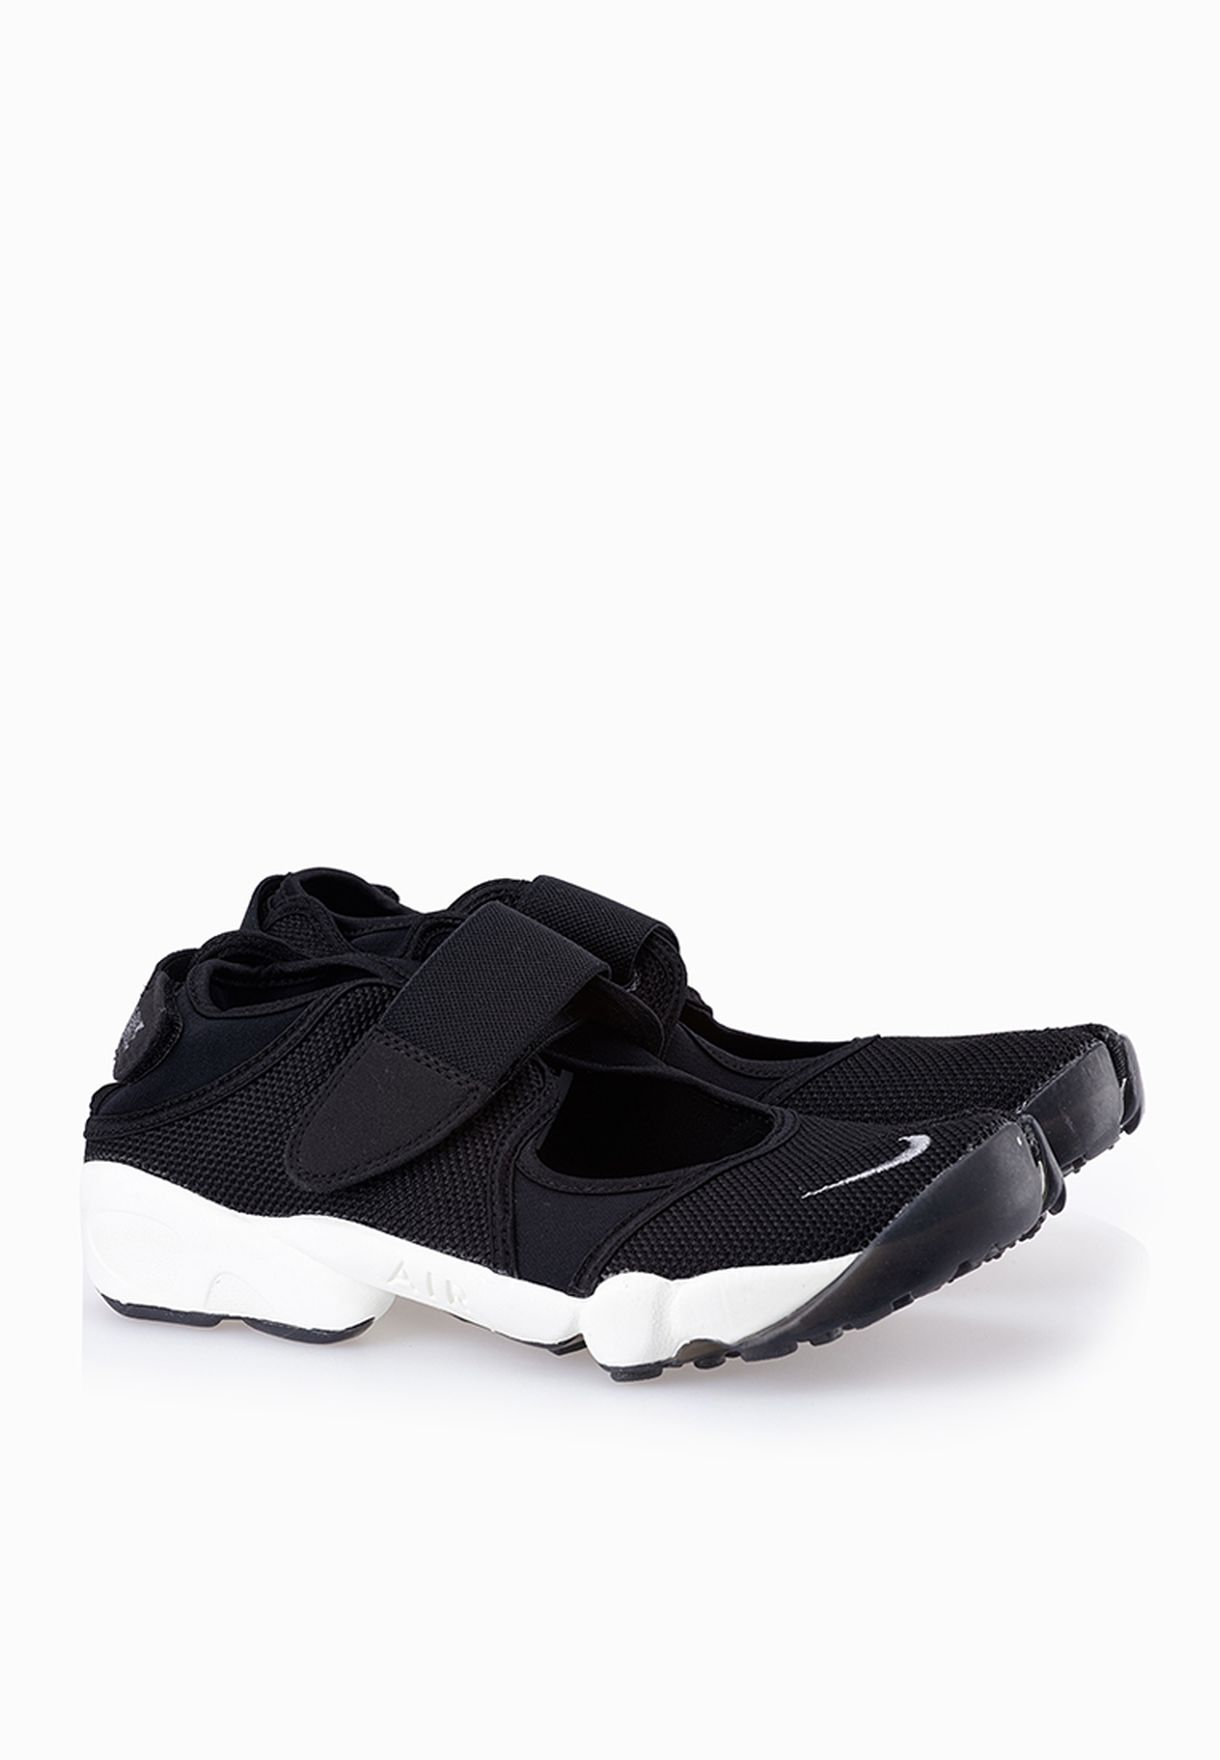 san francisco 84315 181f7 Air Rift Sneakers